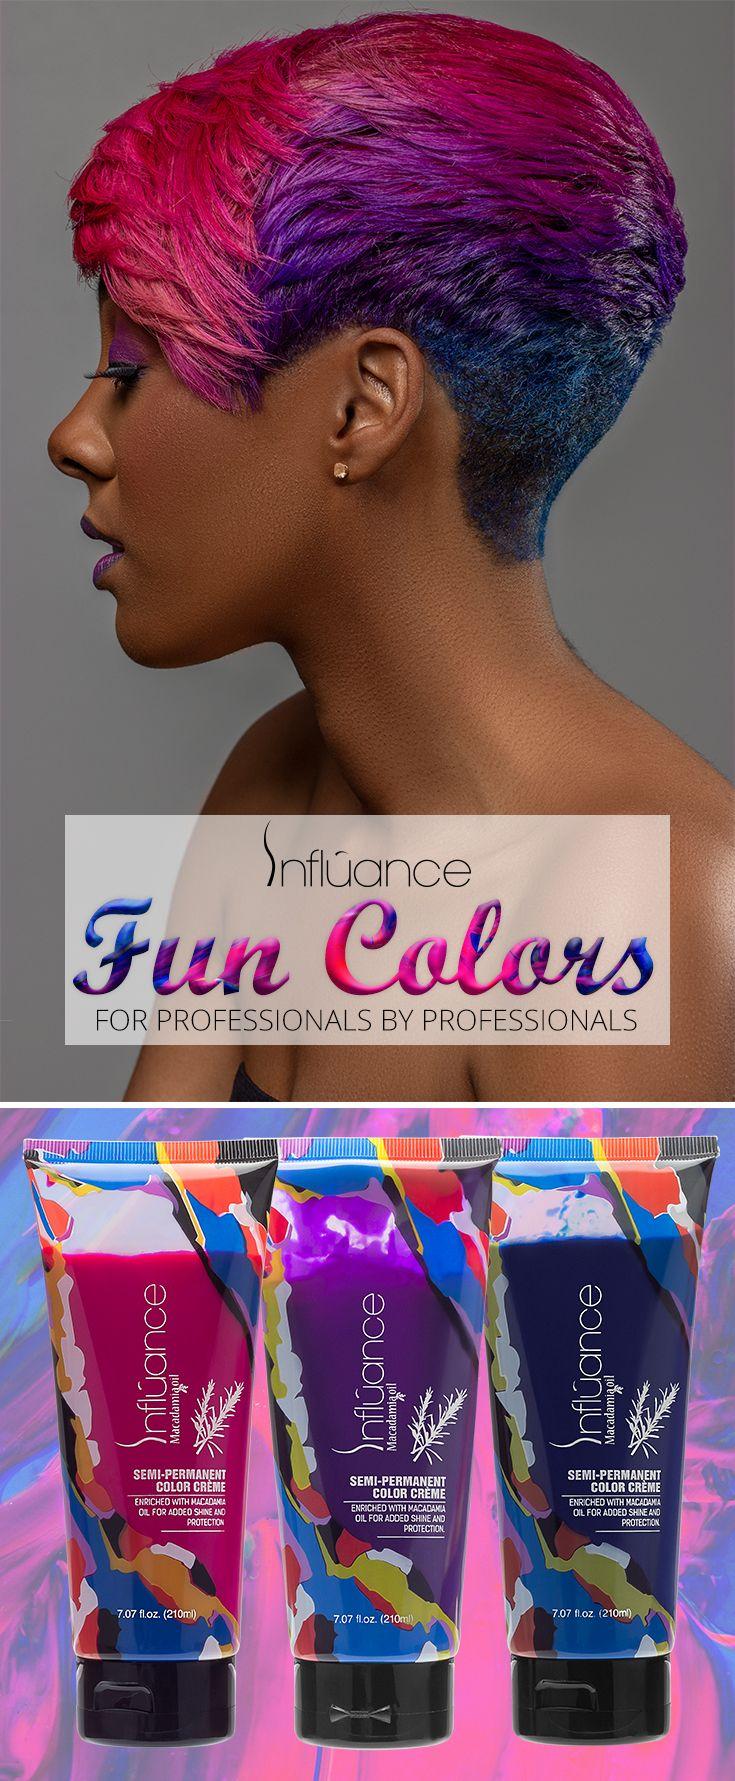 Influance Hair Care Fun Colors For Professionals By Professionals Capelli Piu Corti Capelli